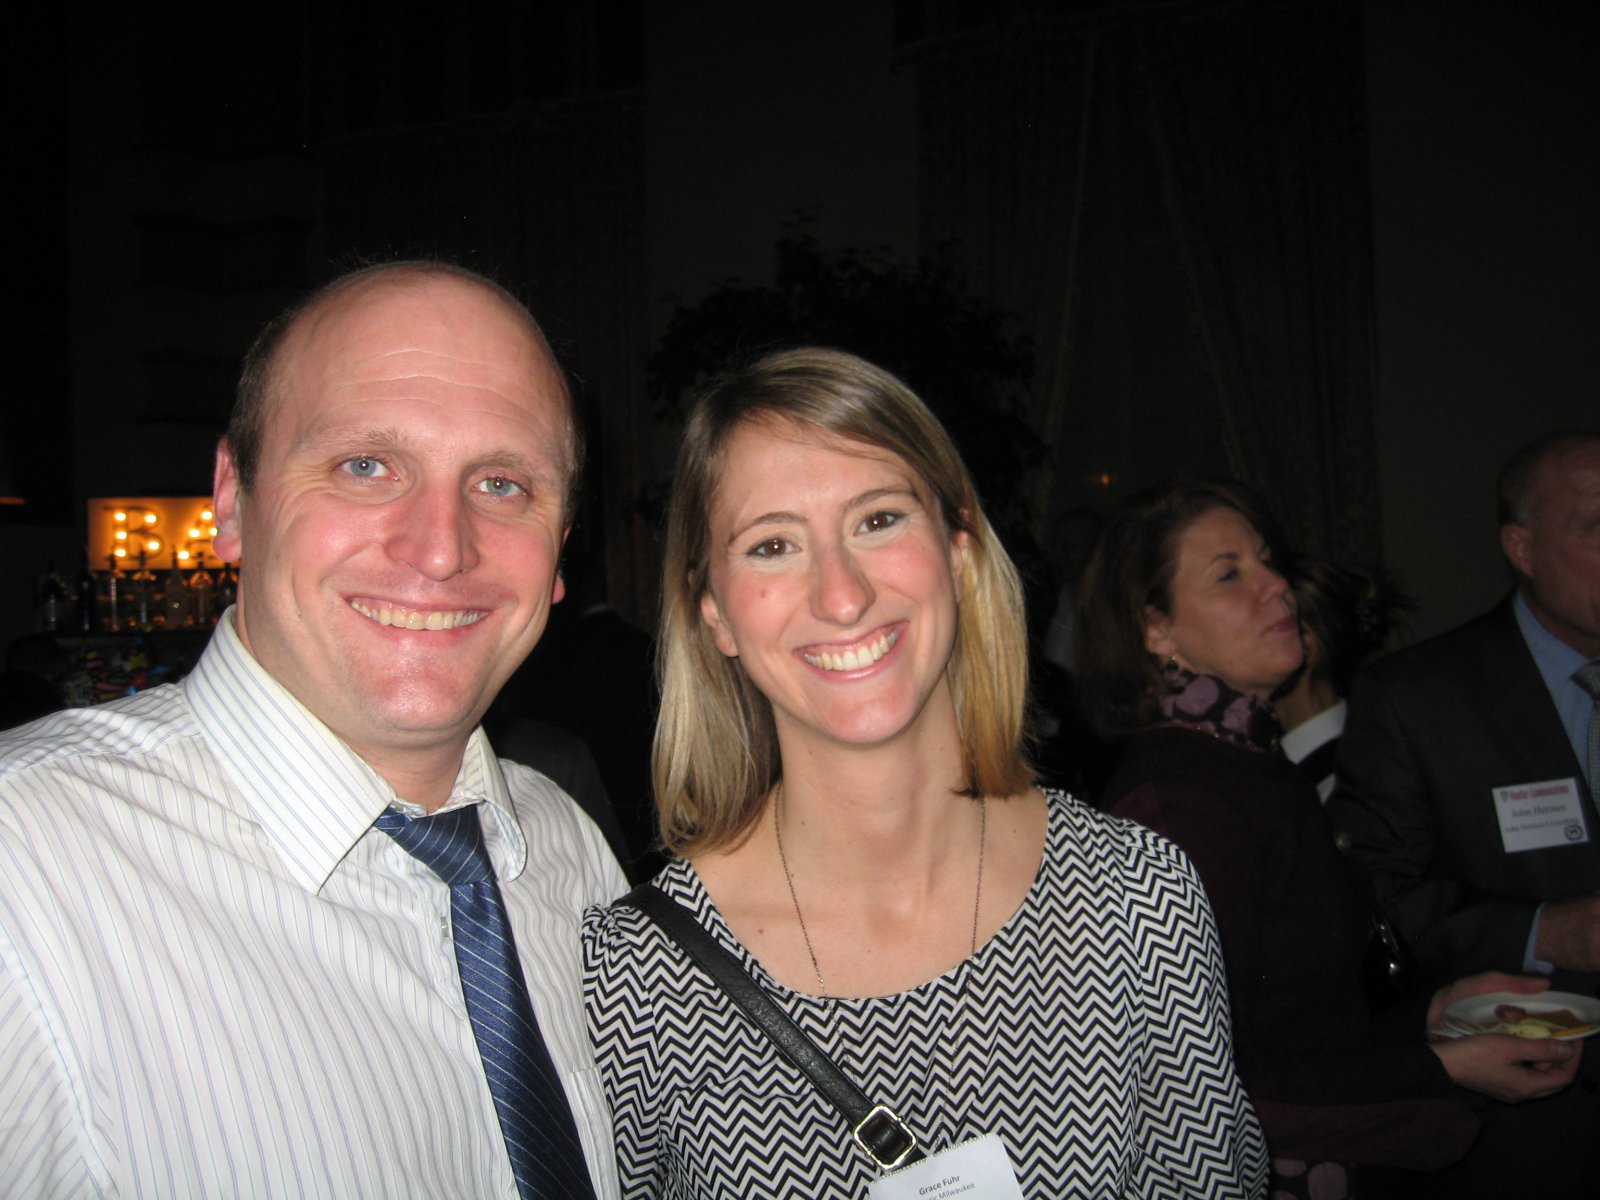 Nik Kovac and Grace Fuhr